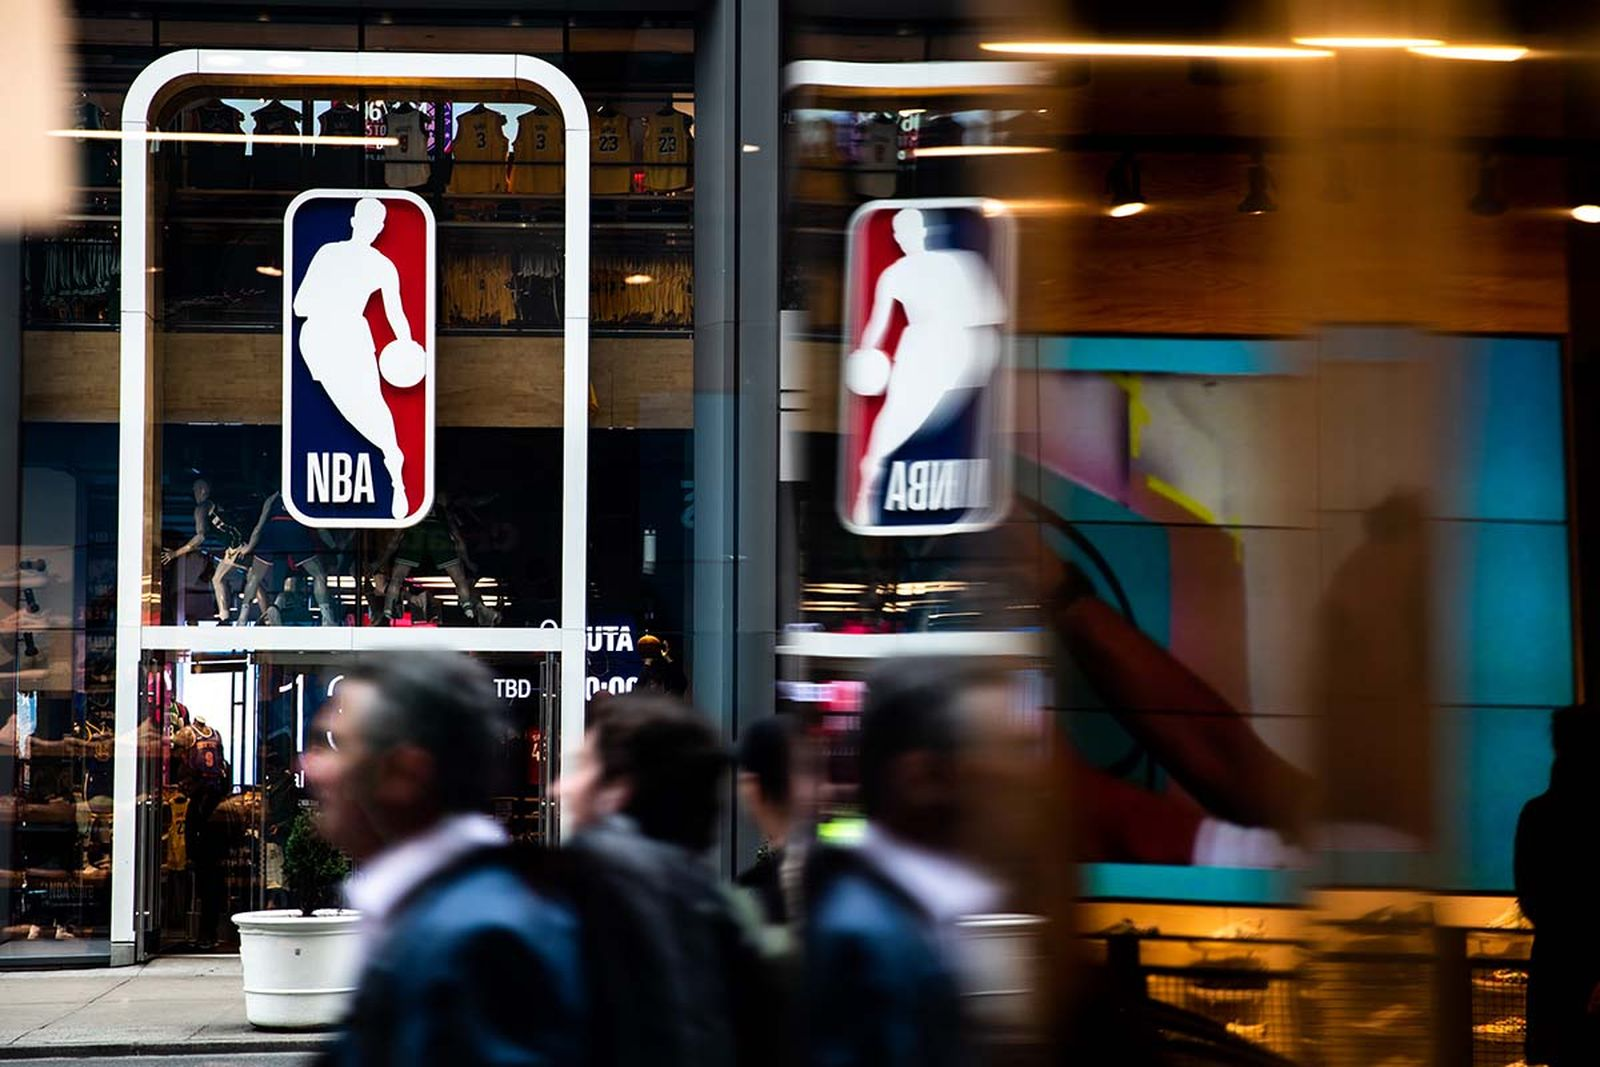 An NBA logo is shown at the 5th Avenue NBA store